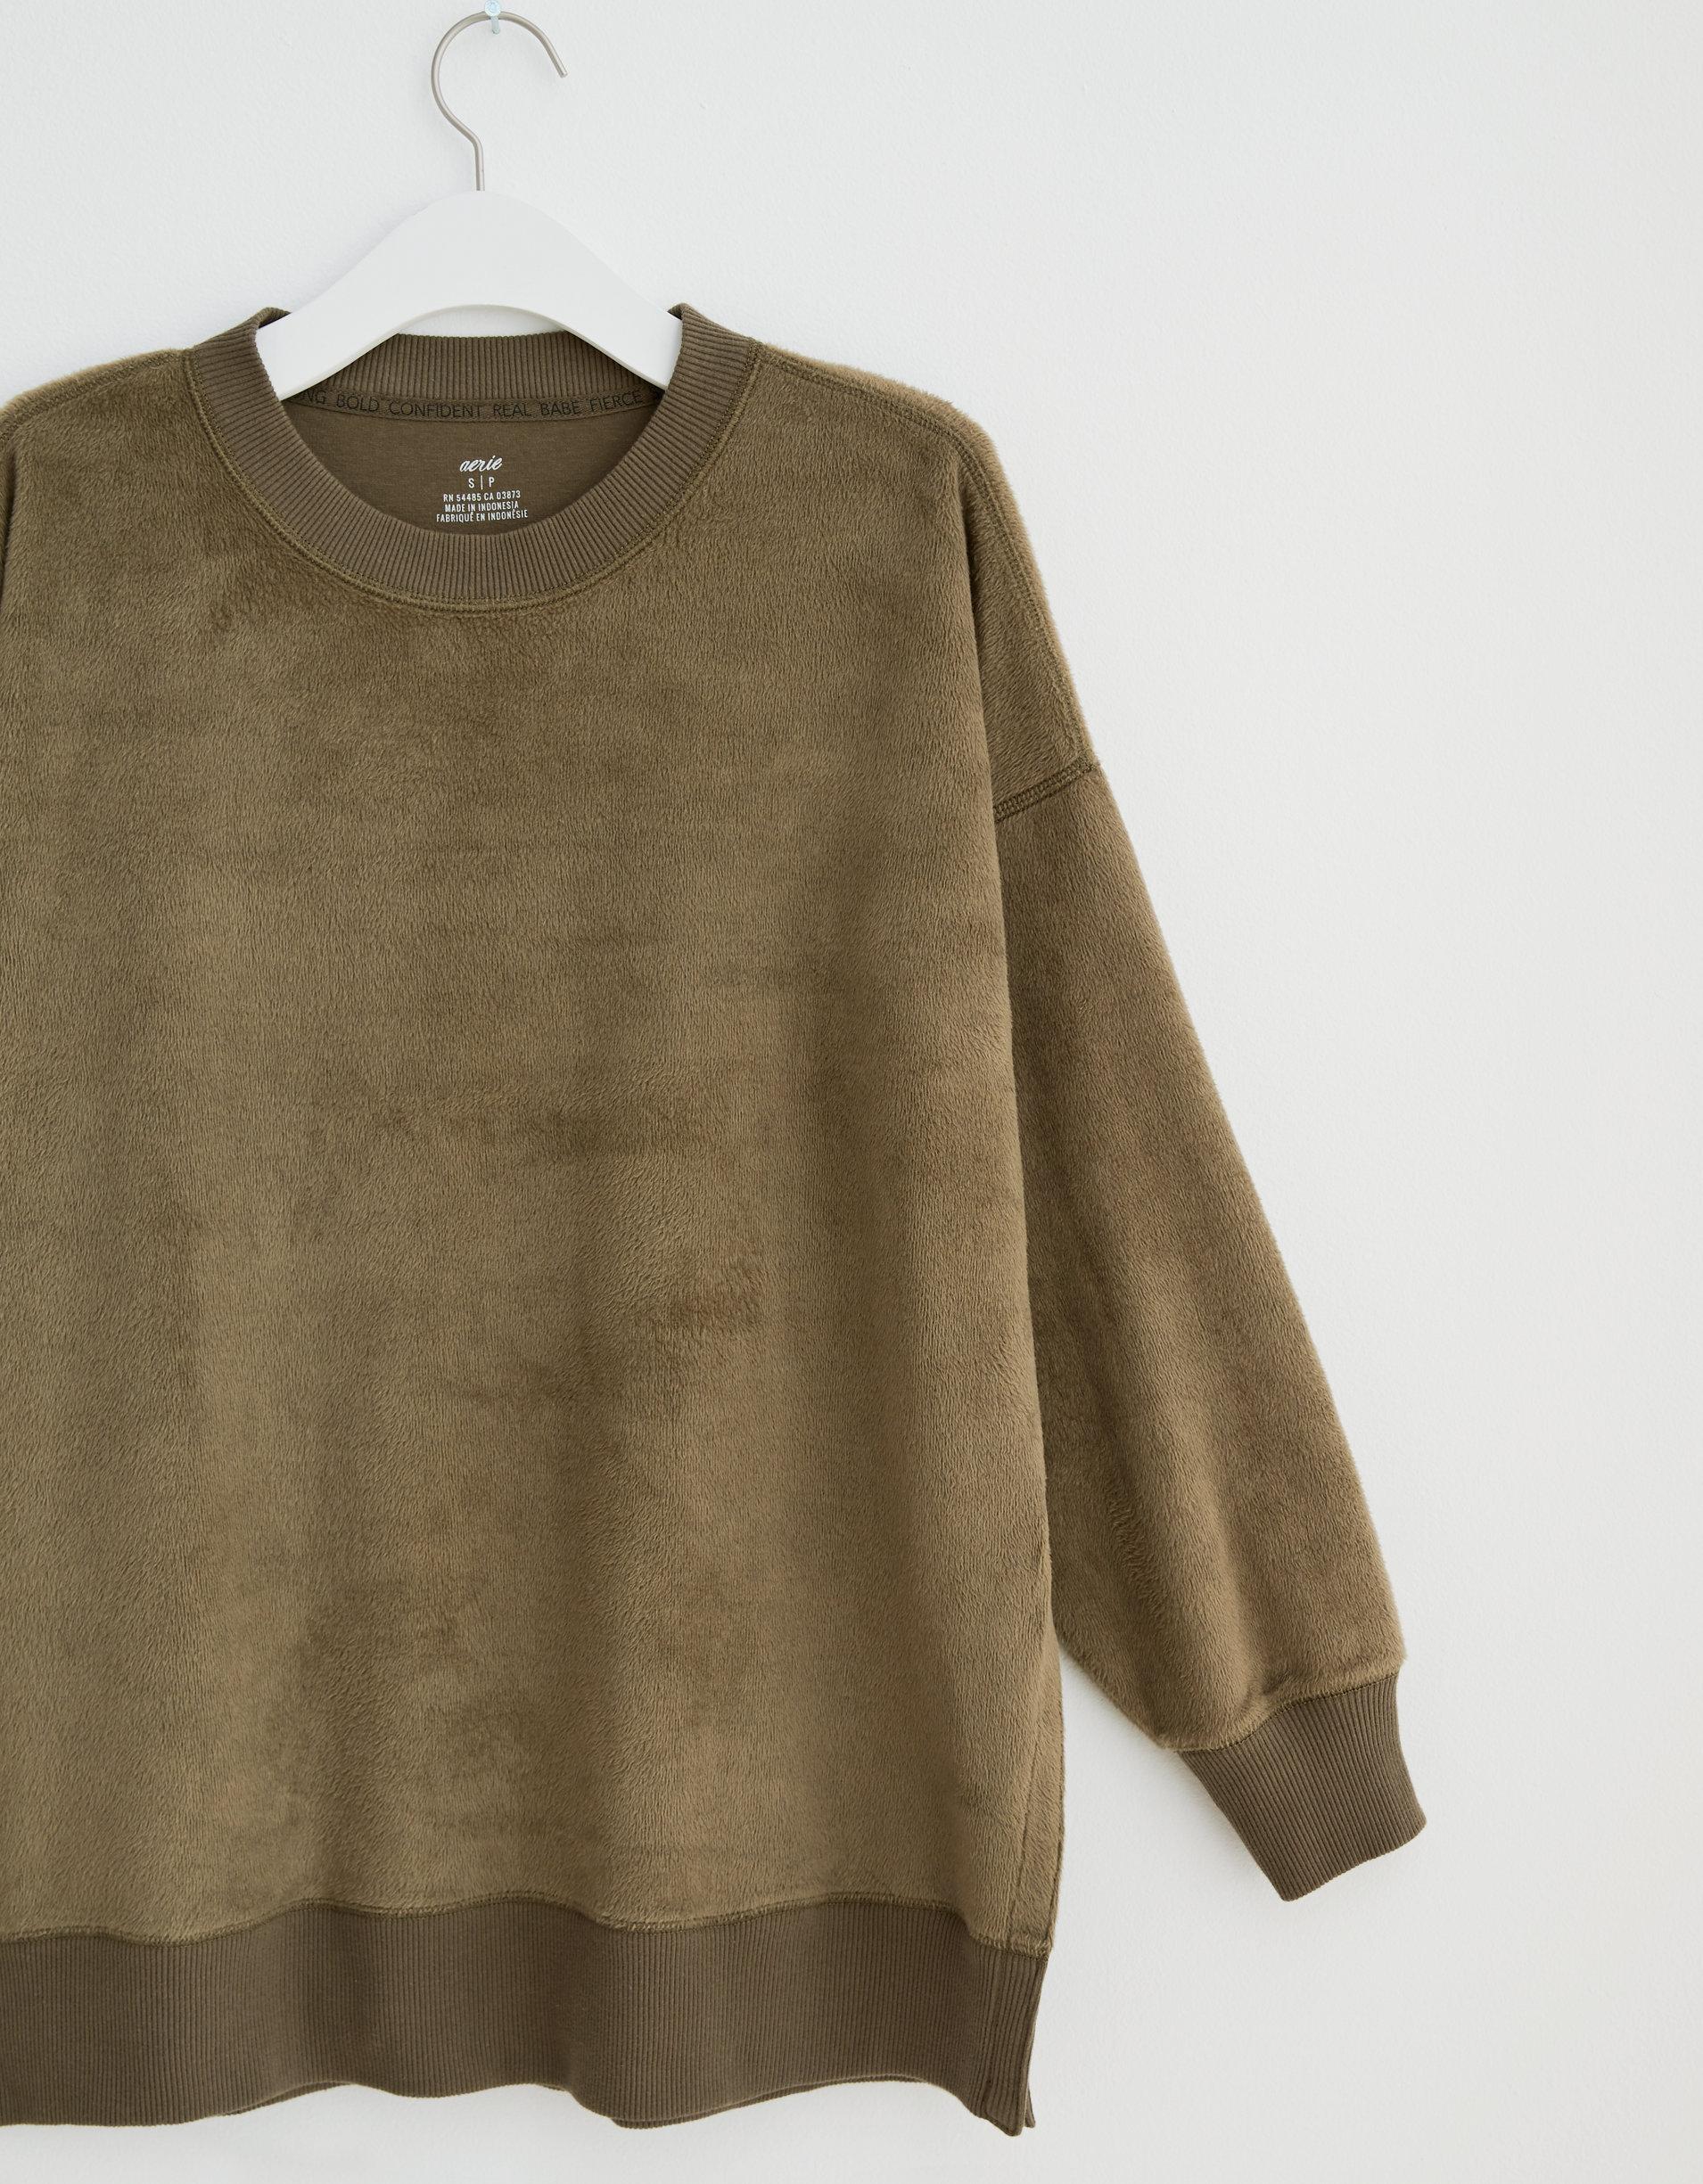 Aerie Oversized Coziest Desert Sweatshirt